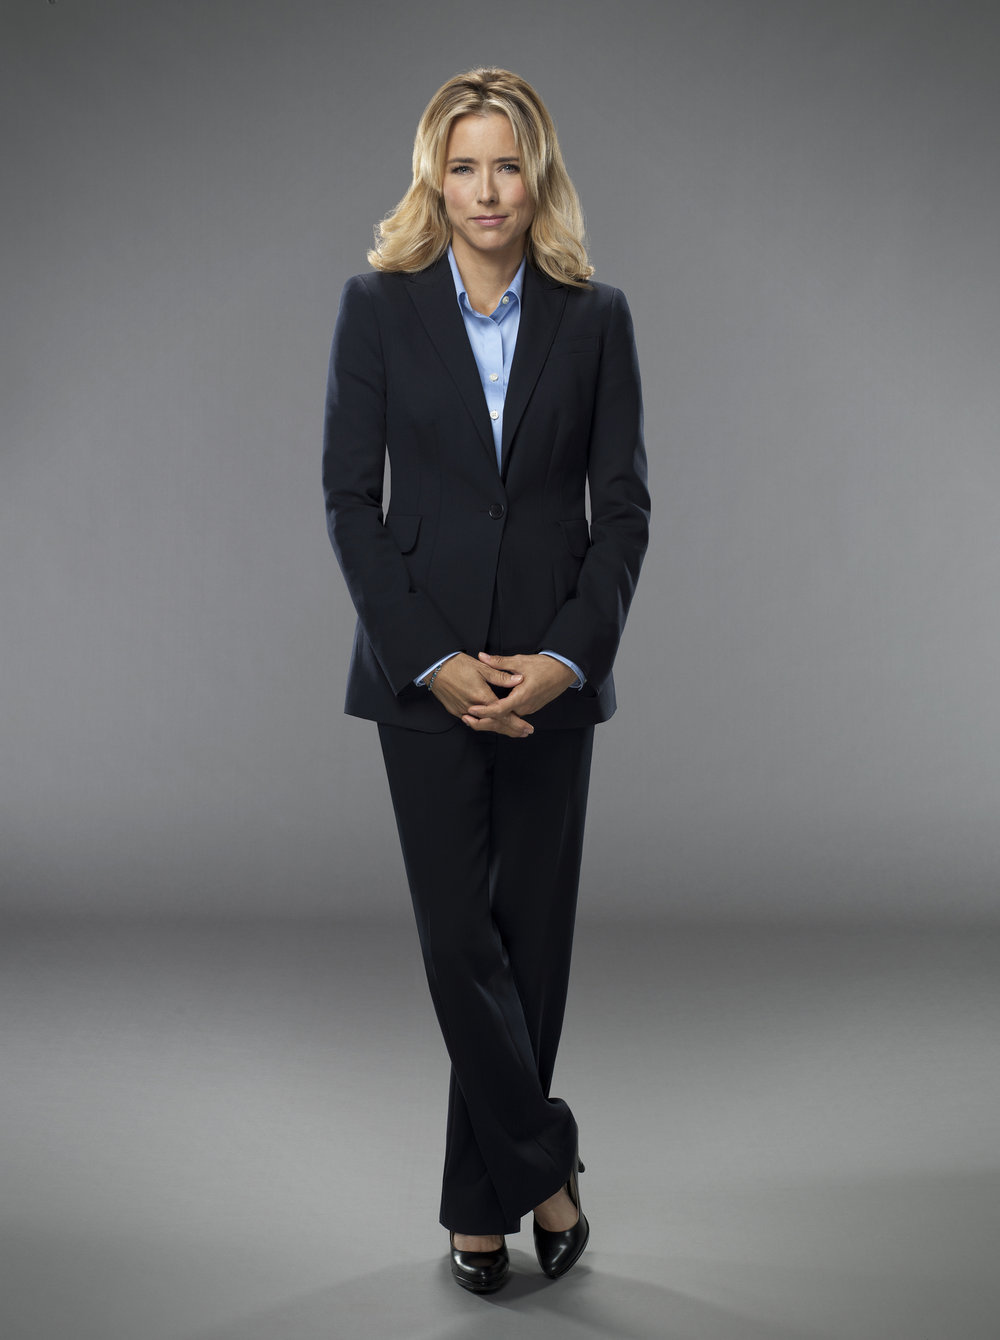 Madam Secretary Source: 10 Network